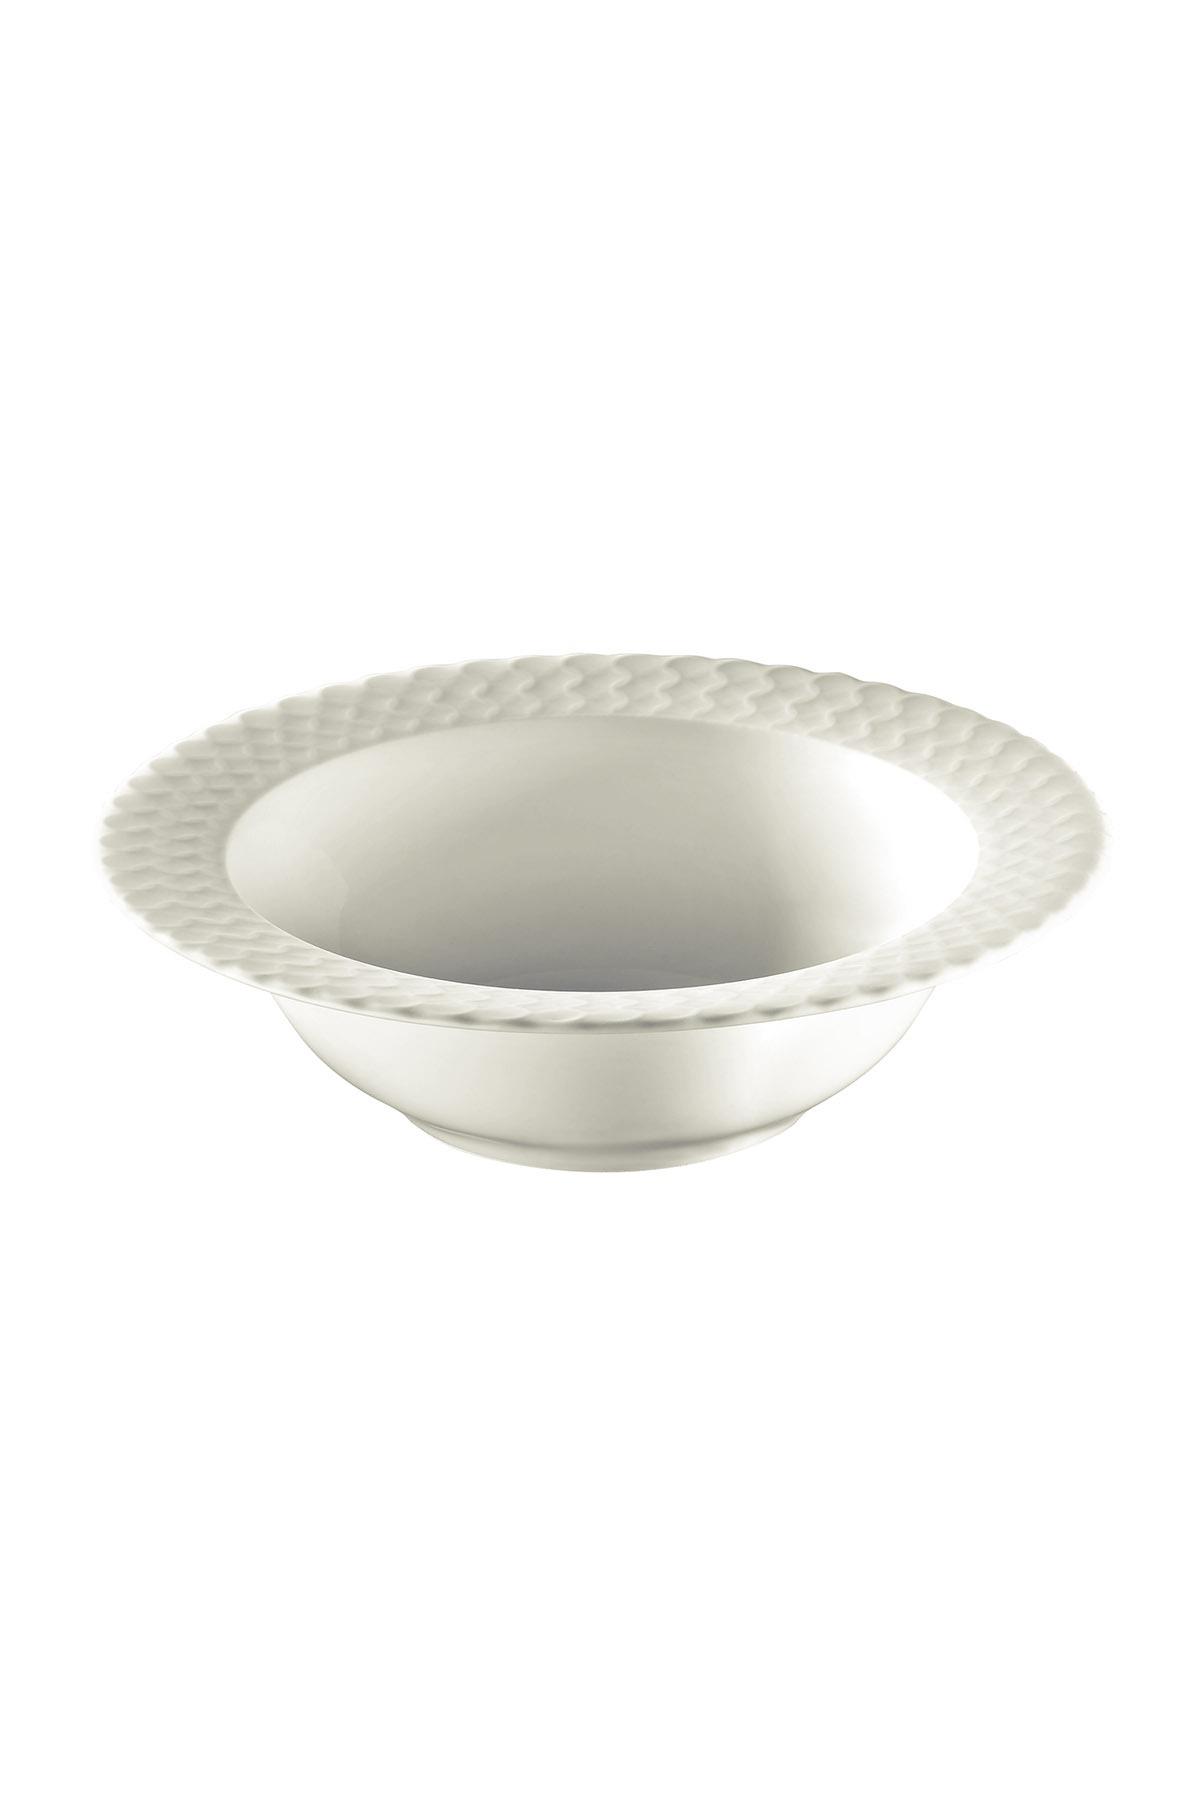 Kütahya Porselen Bone İron 24 Parça Yemek Seti